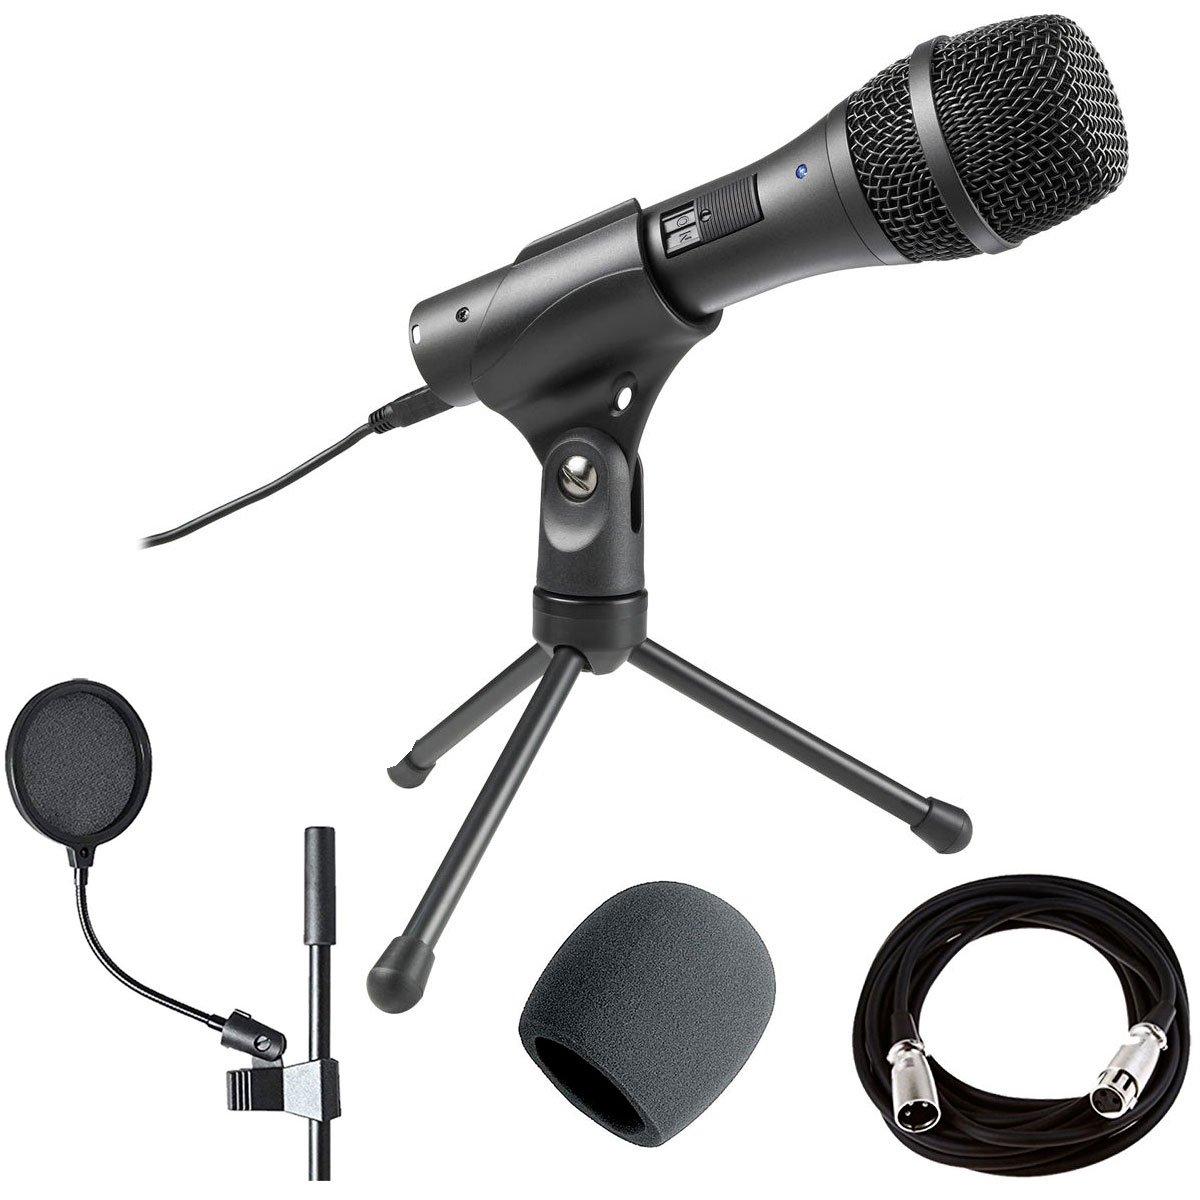 Audio-Technica AT2005USB Cardioid Dynamic USB/XLR Microphone + On Stage XLR Mic Cable + Foam Windscreen, Black & Pop Blocker 4'' + Accessory Bundle by Audio-Technica